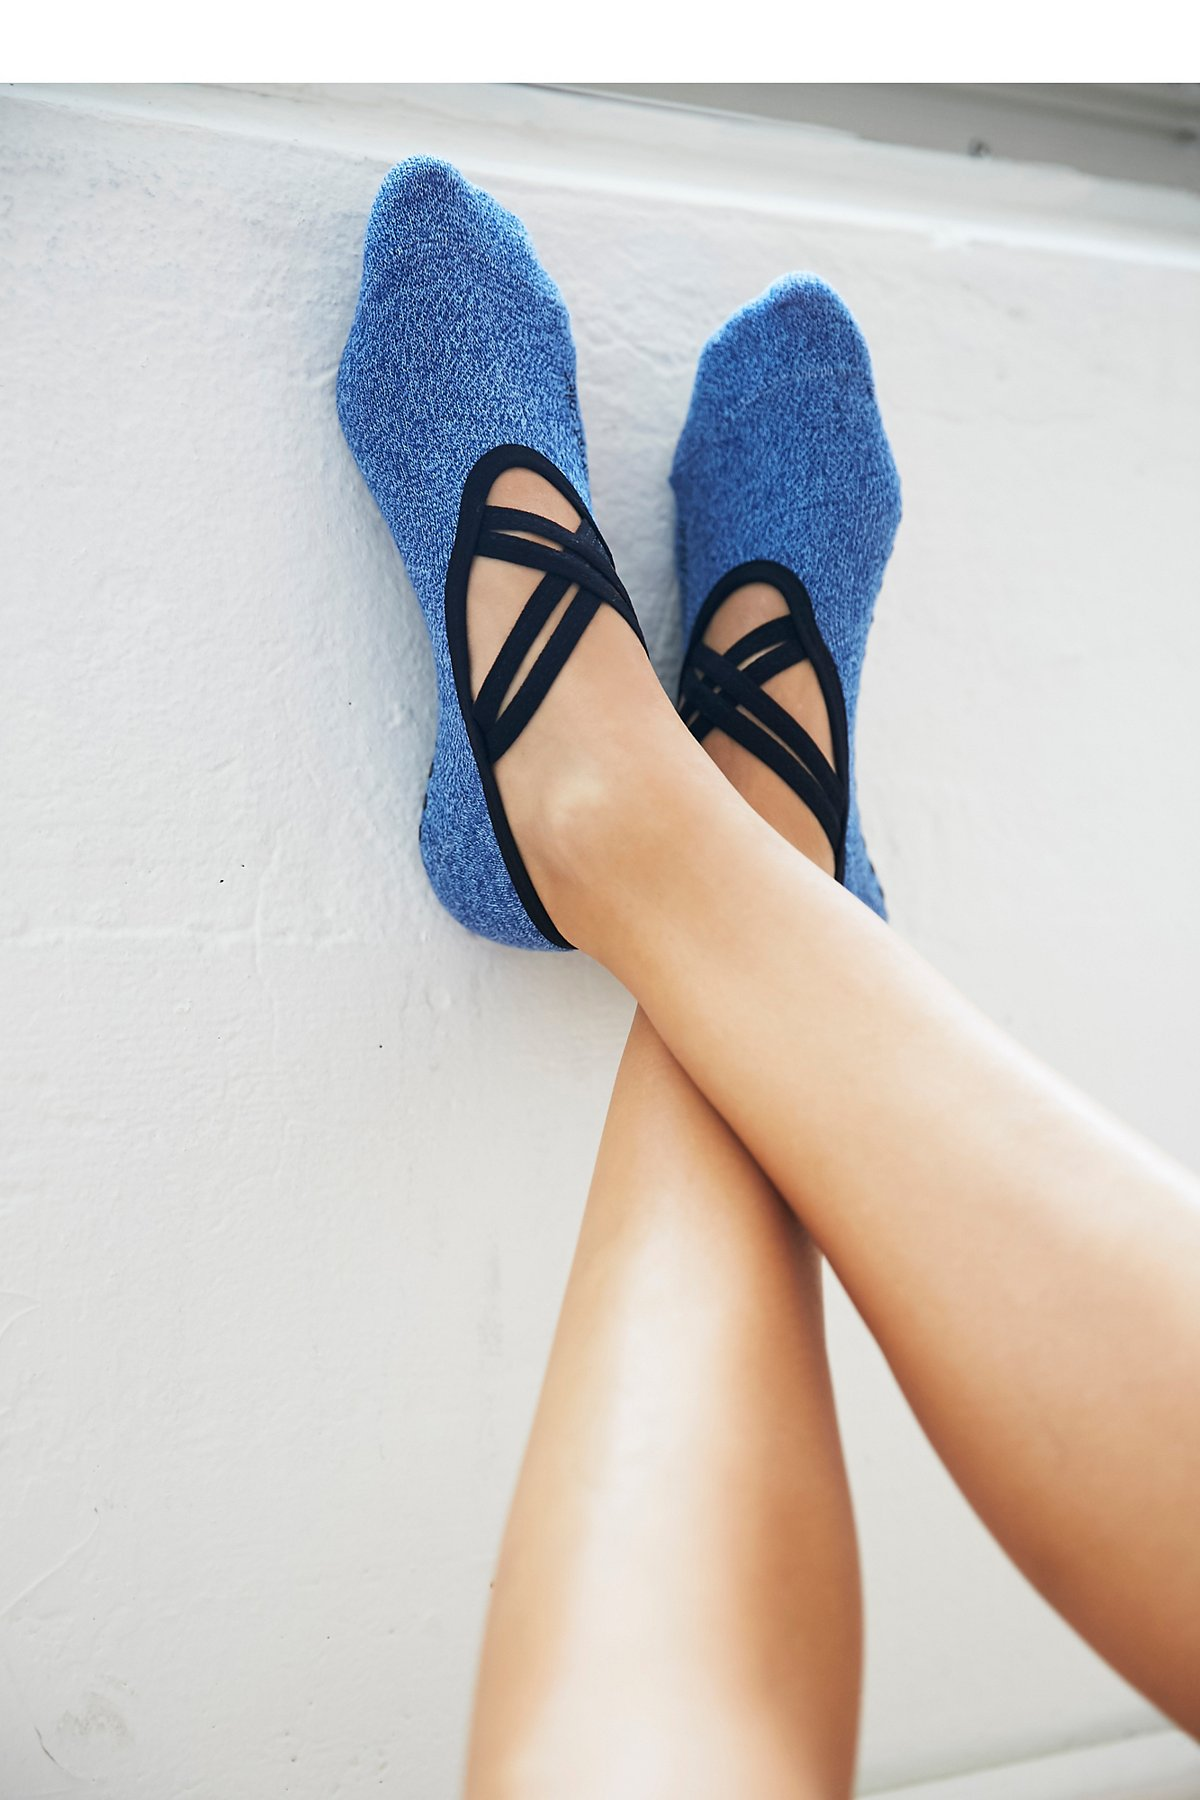 Criss Cross Ballet Barre Yoga Sock